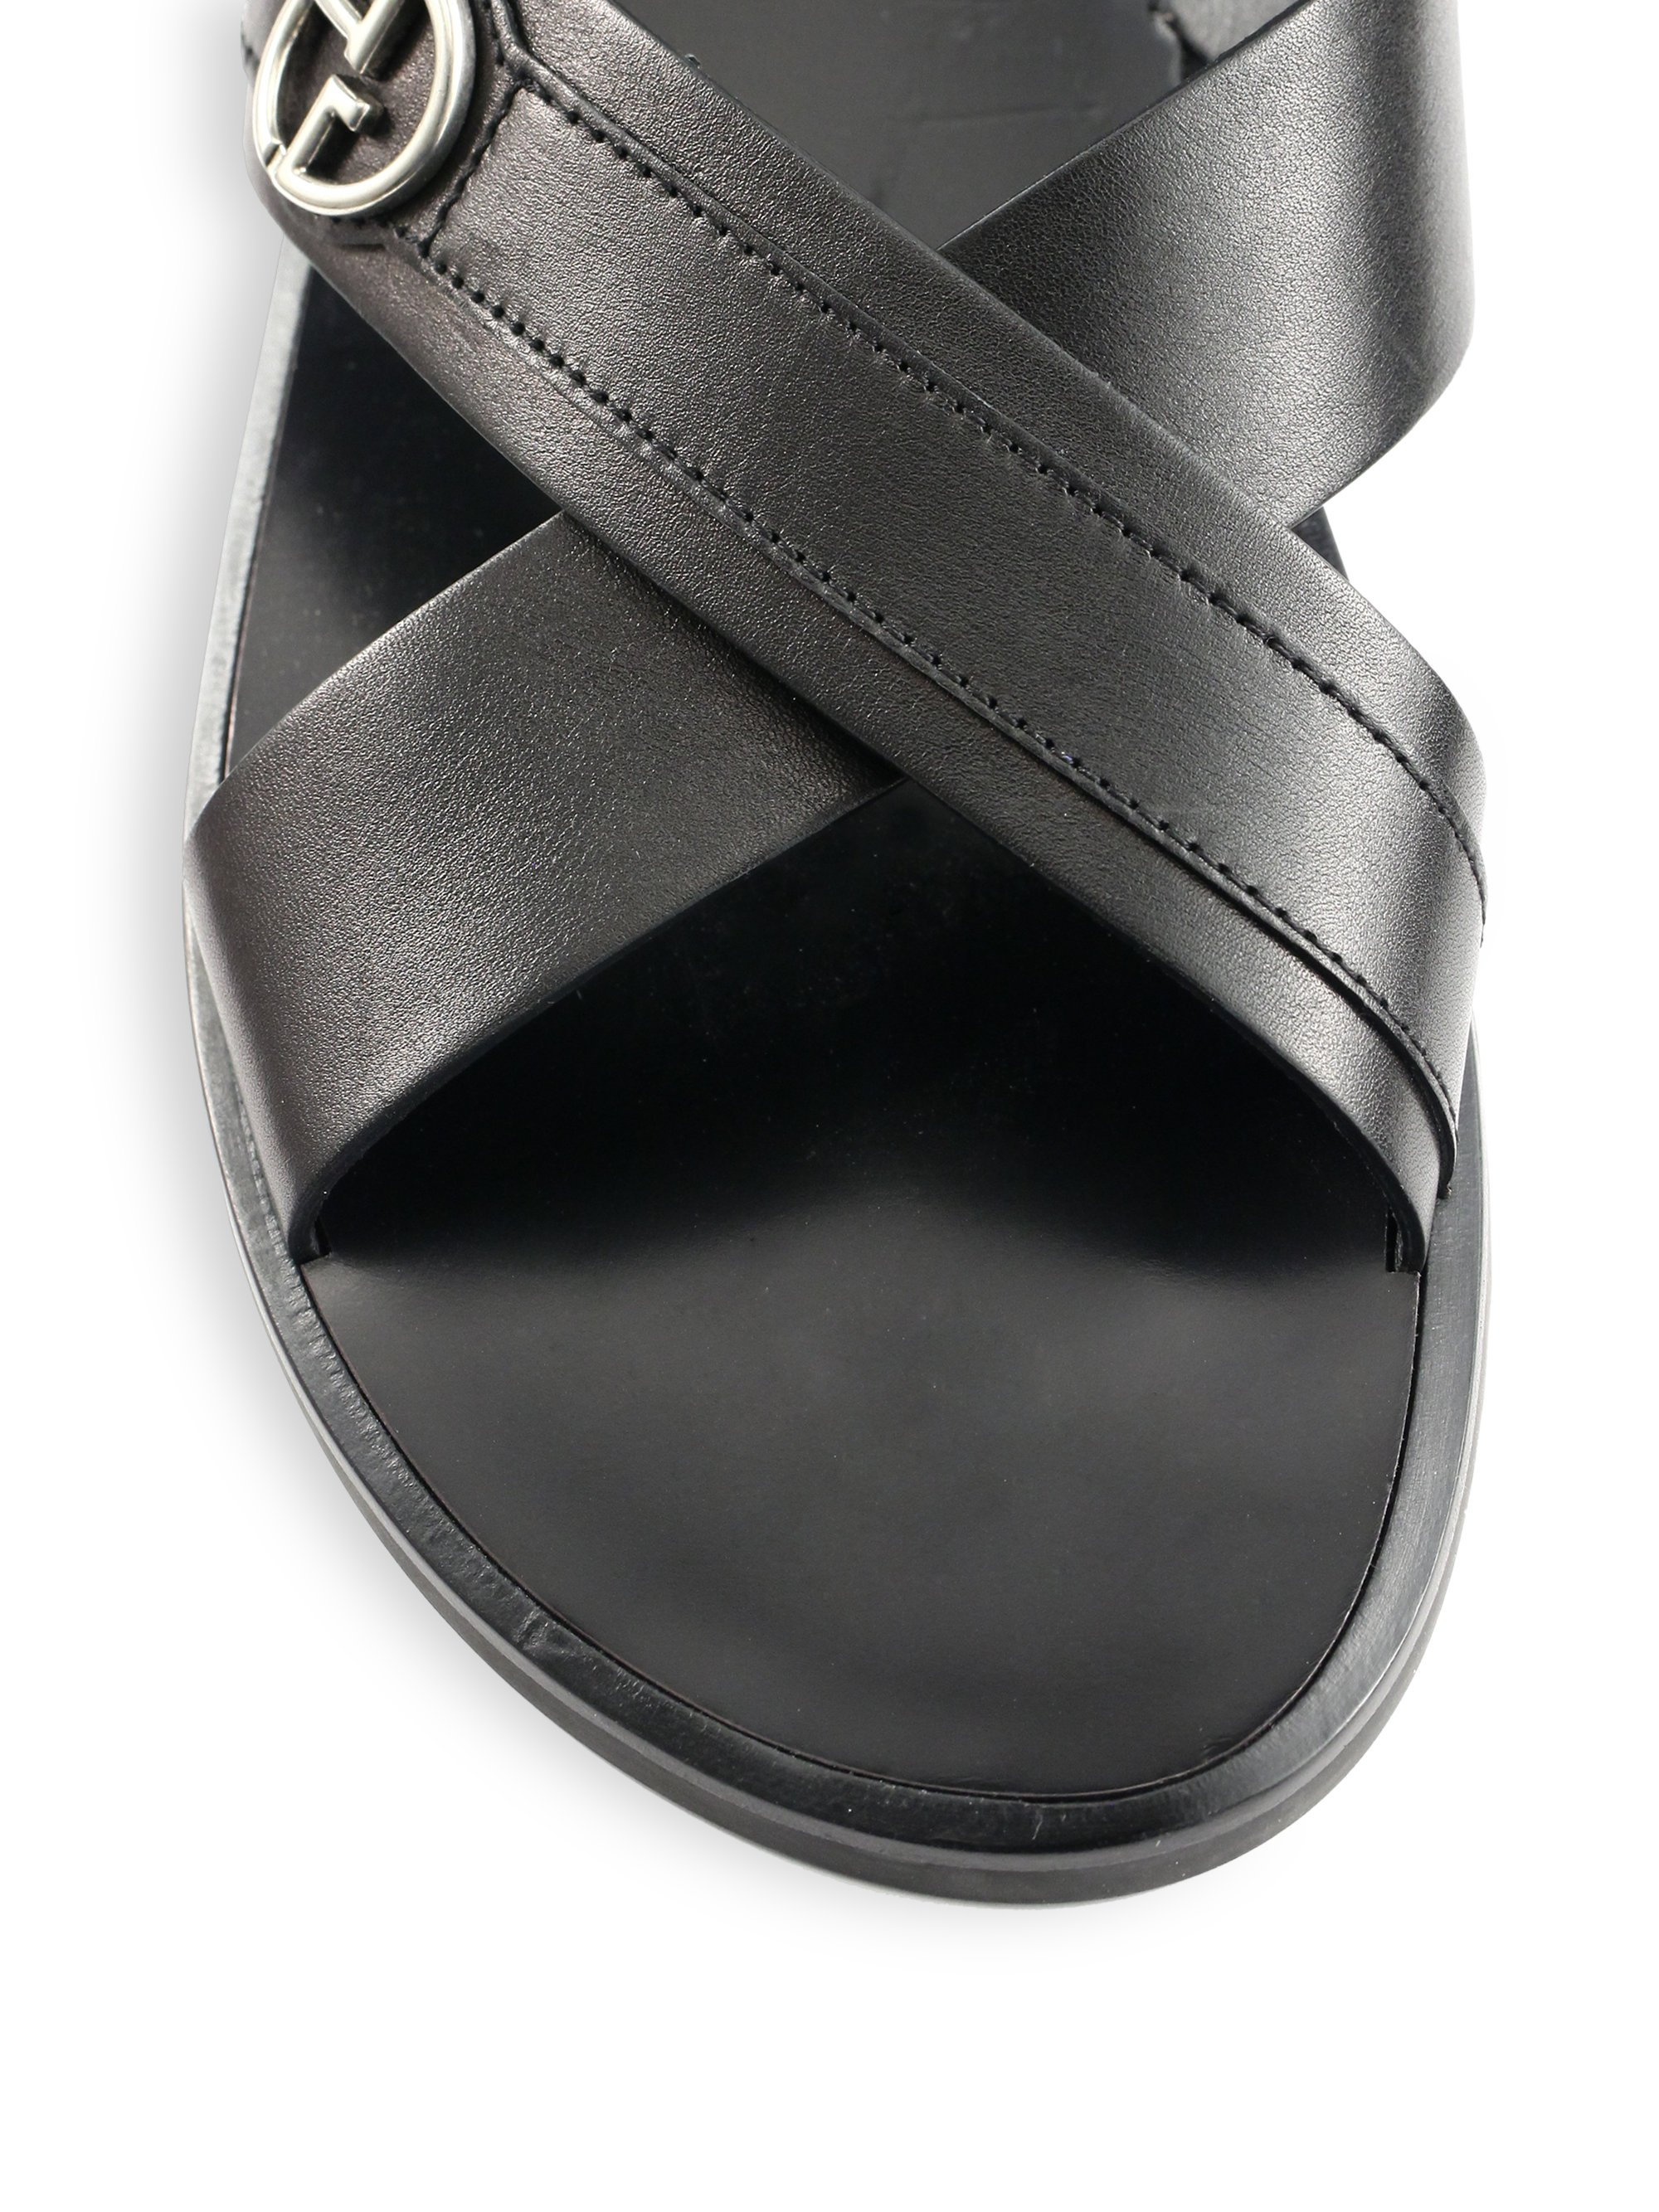 4ab75c450 Lyst - Giorgio Armani Leather Logo Sandals in Black for Men